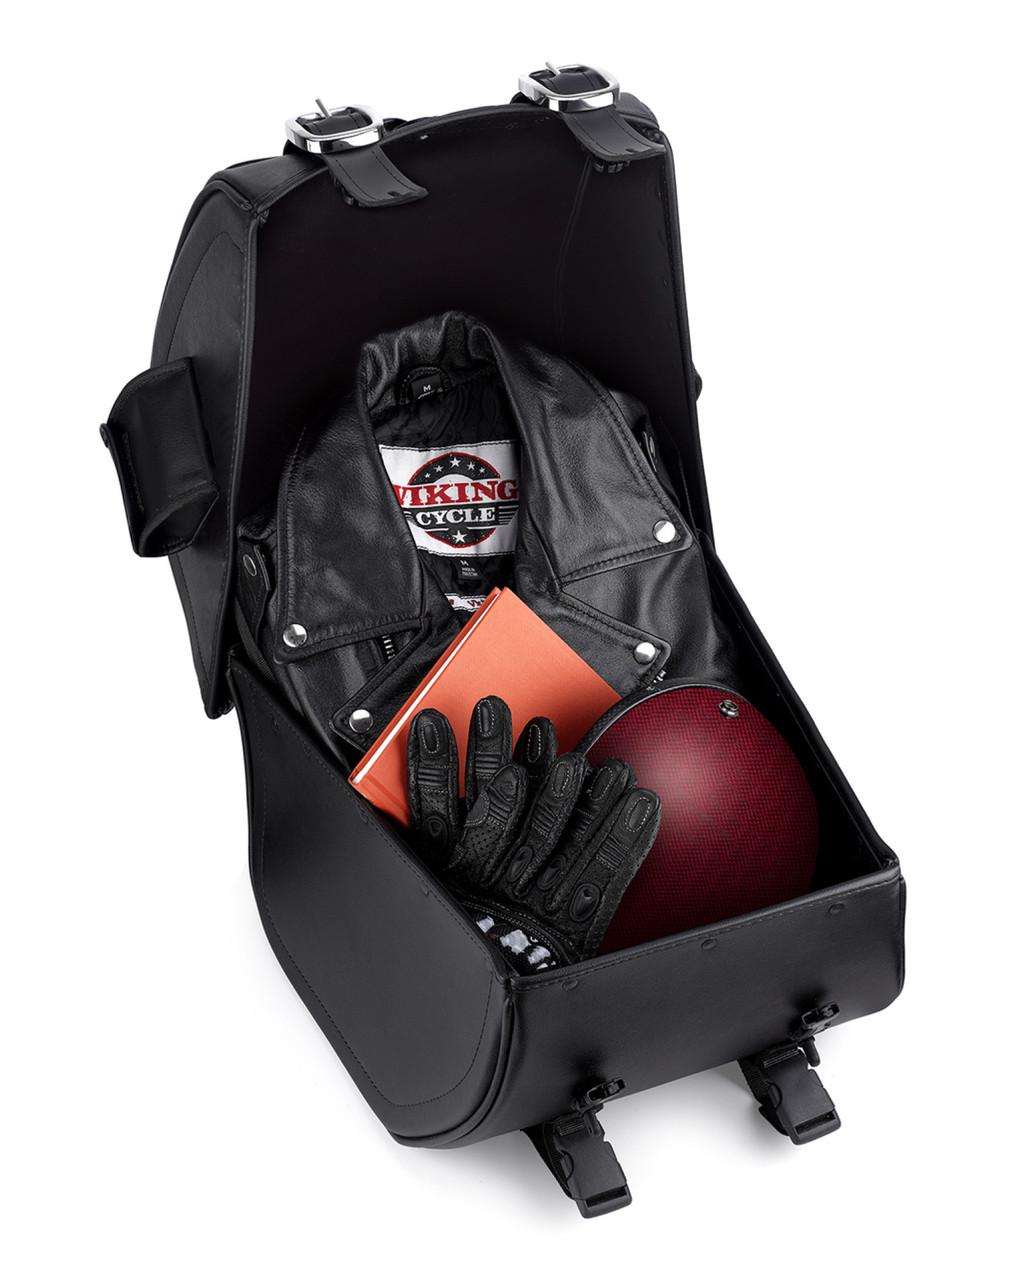 Honda Viking Classic Motorcycle Sissy Bar Bag Storage View